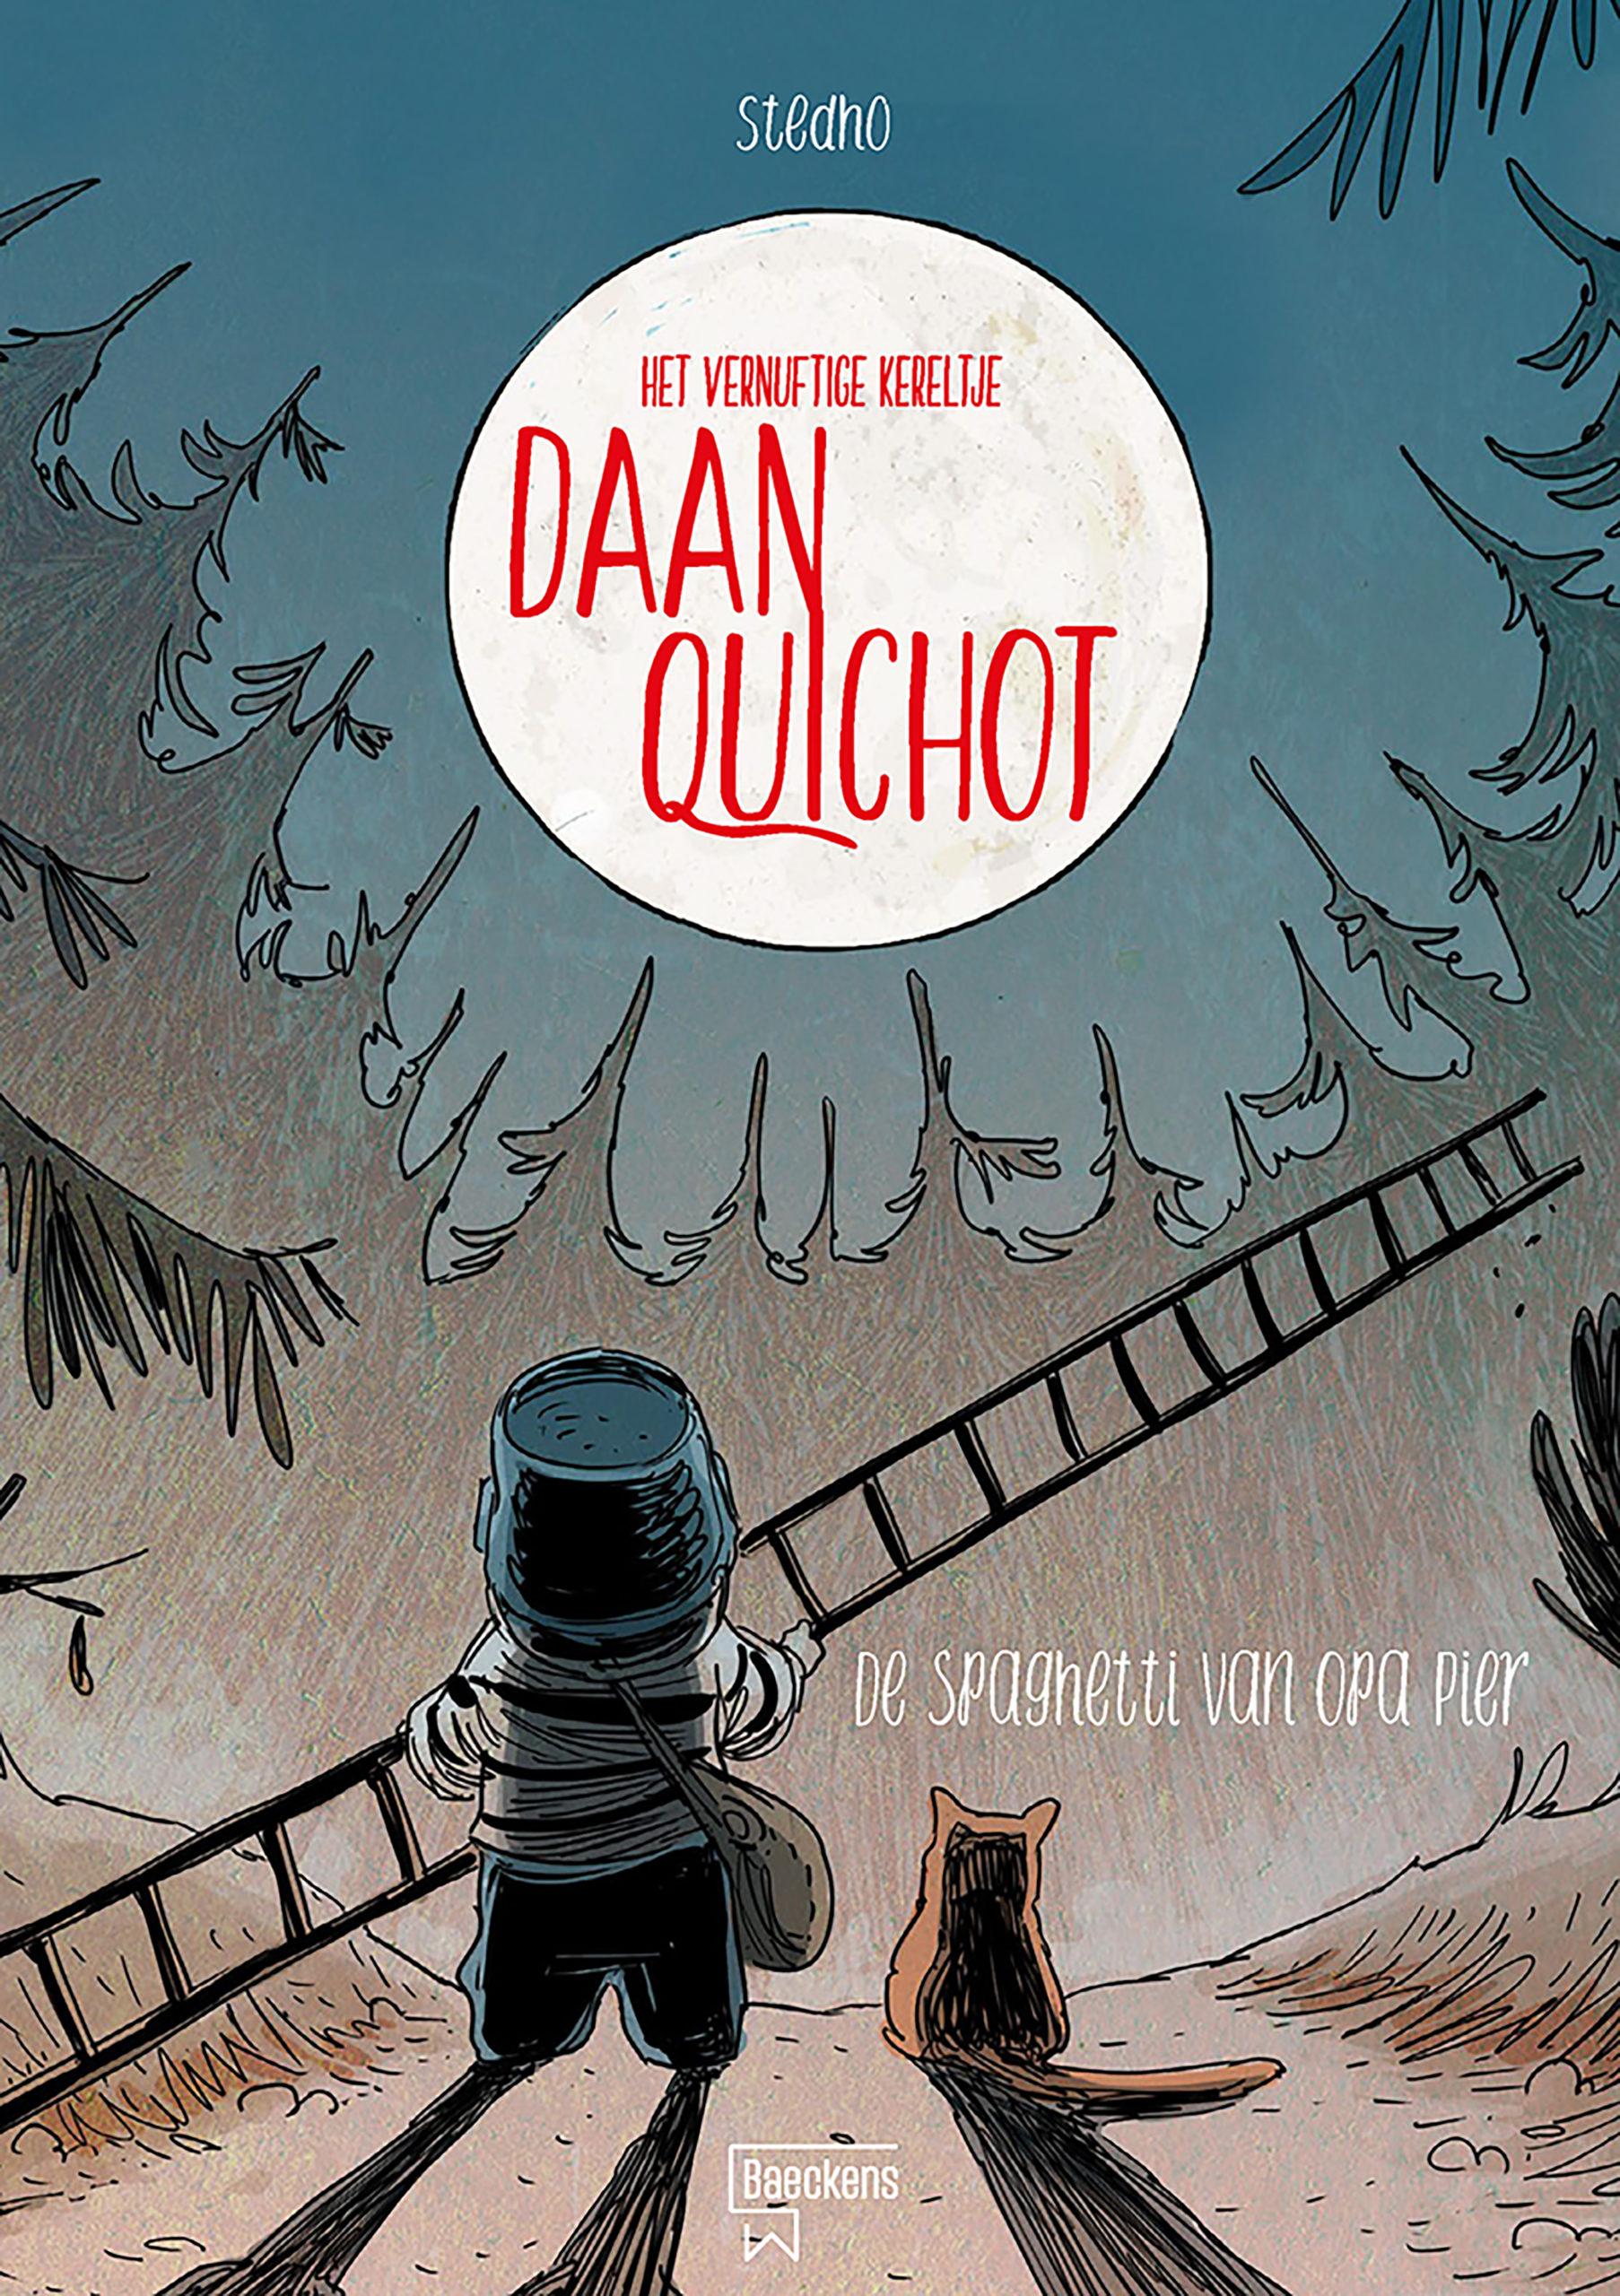 Daan Quichot en de spaghetti van opa pier